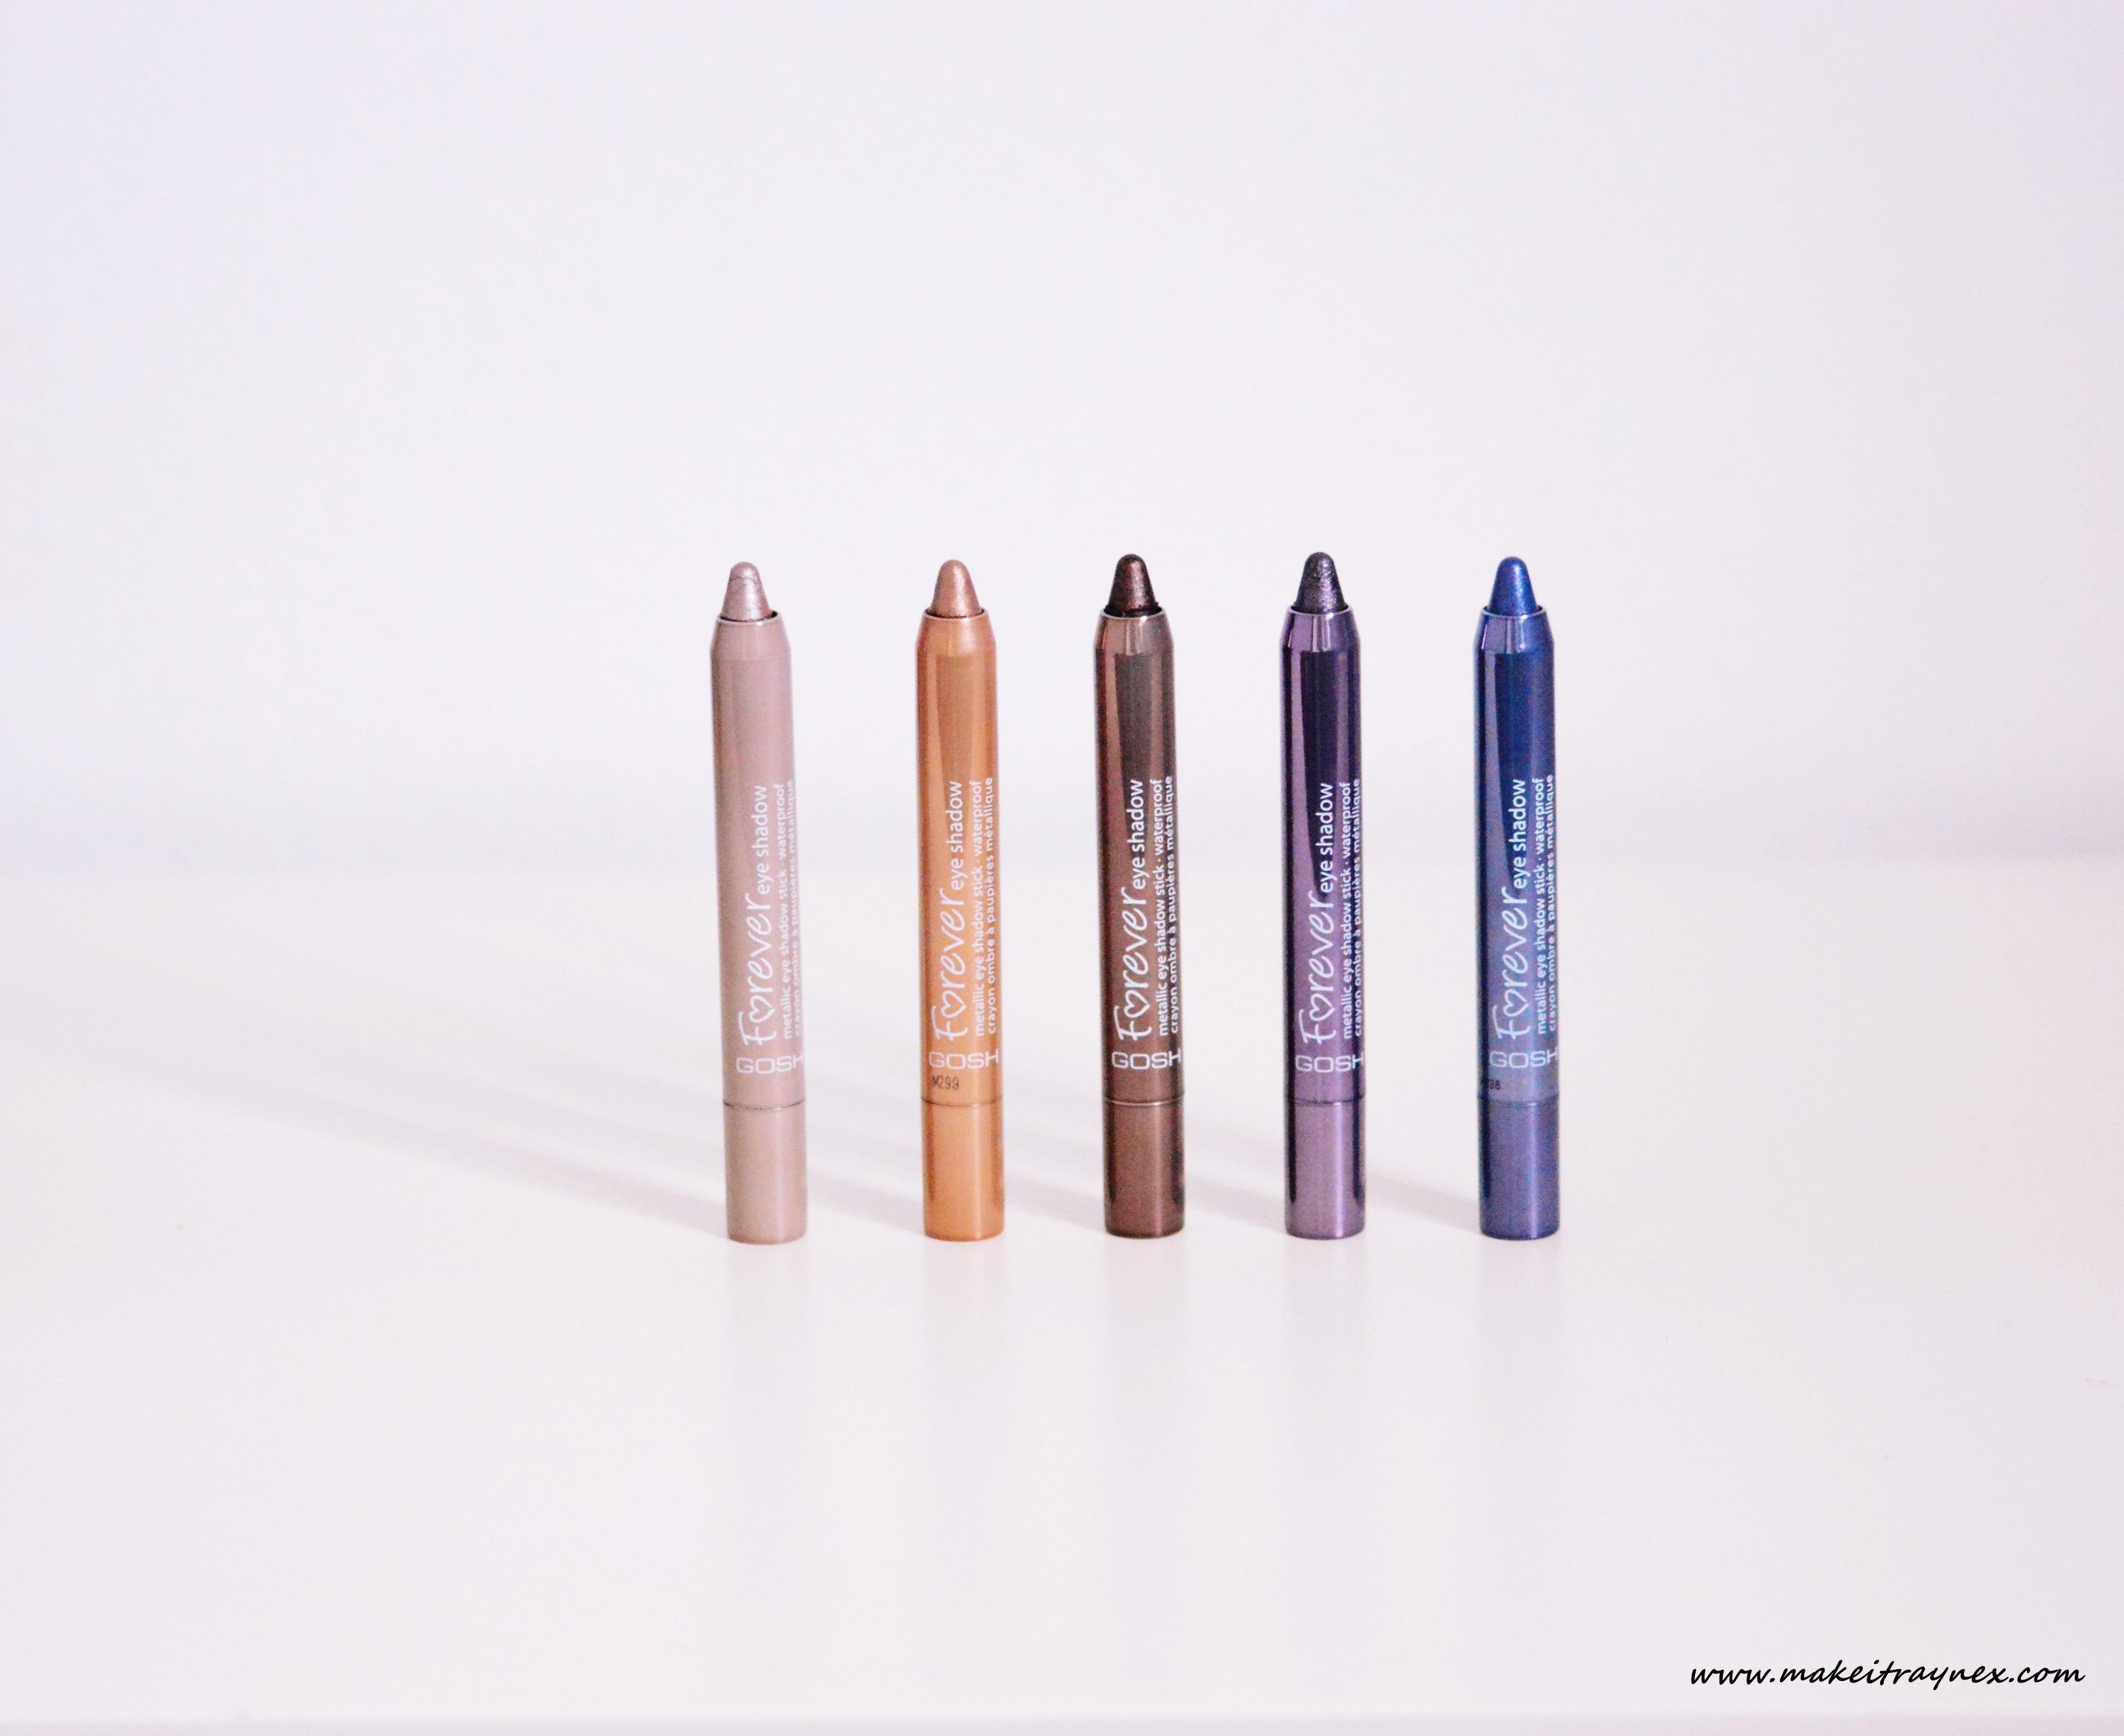 Metallic Forever Eye Shadow Sticks from GOSH {REVIEW}